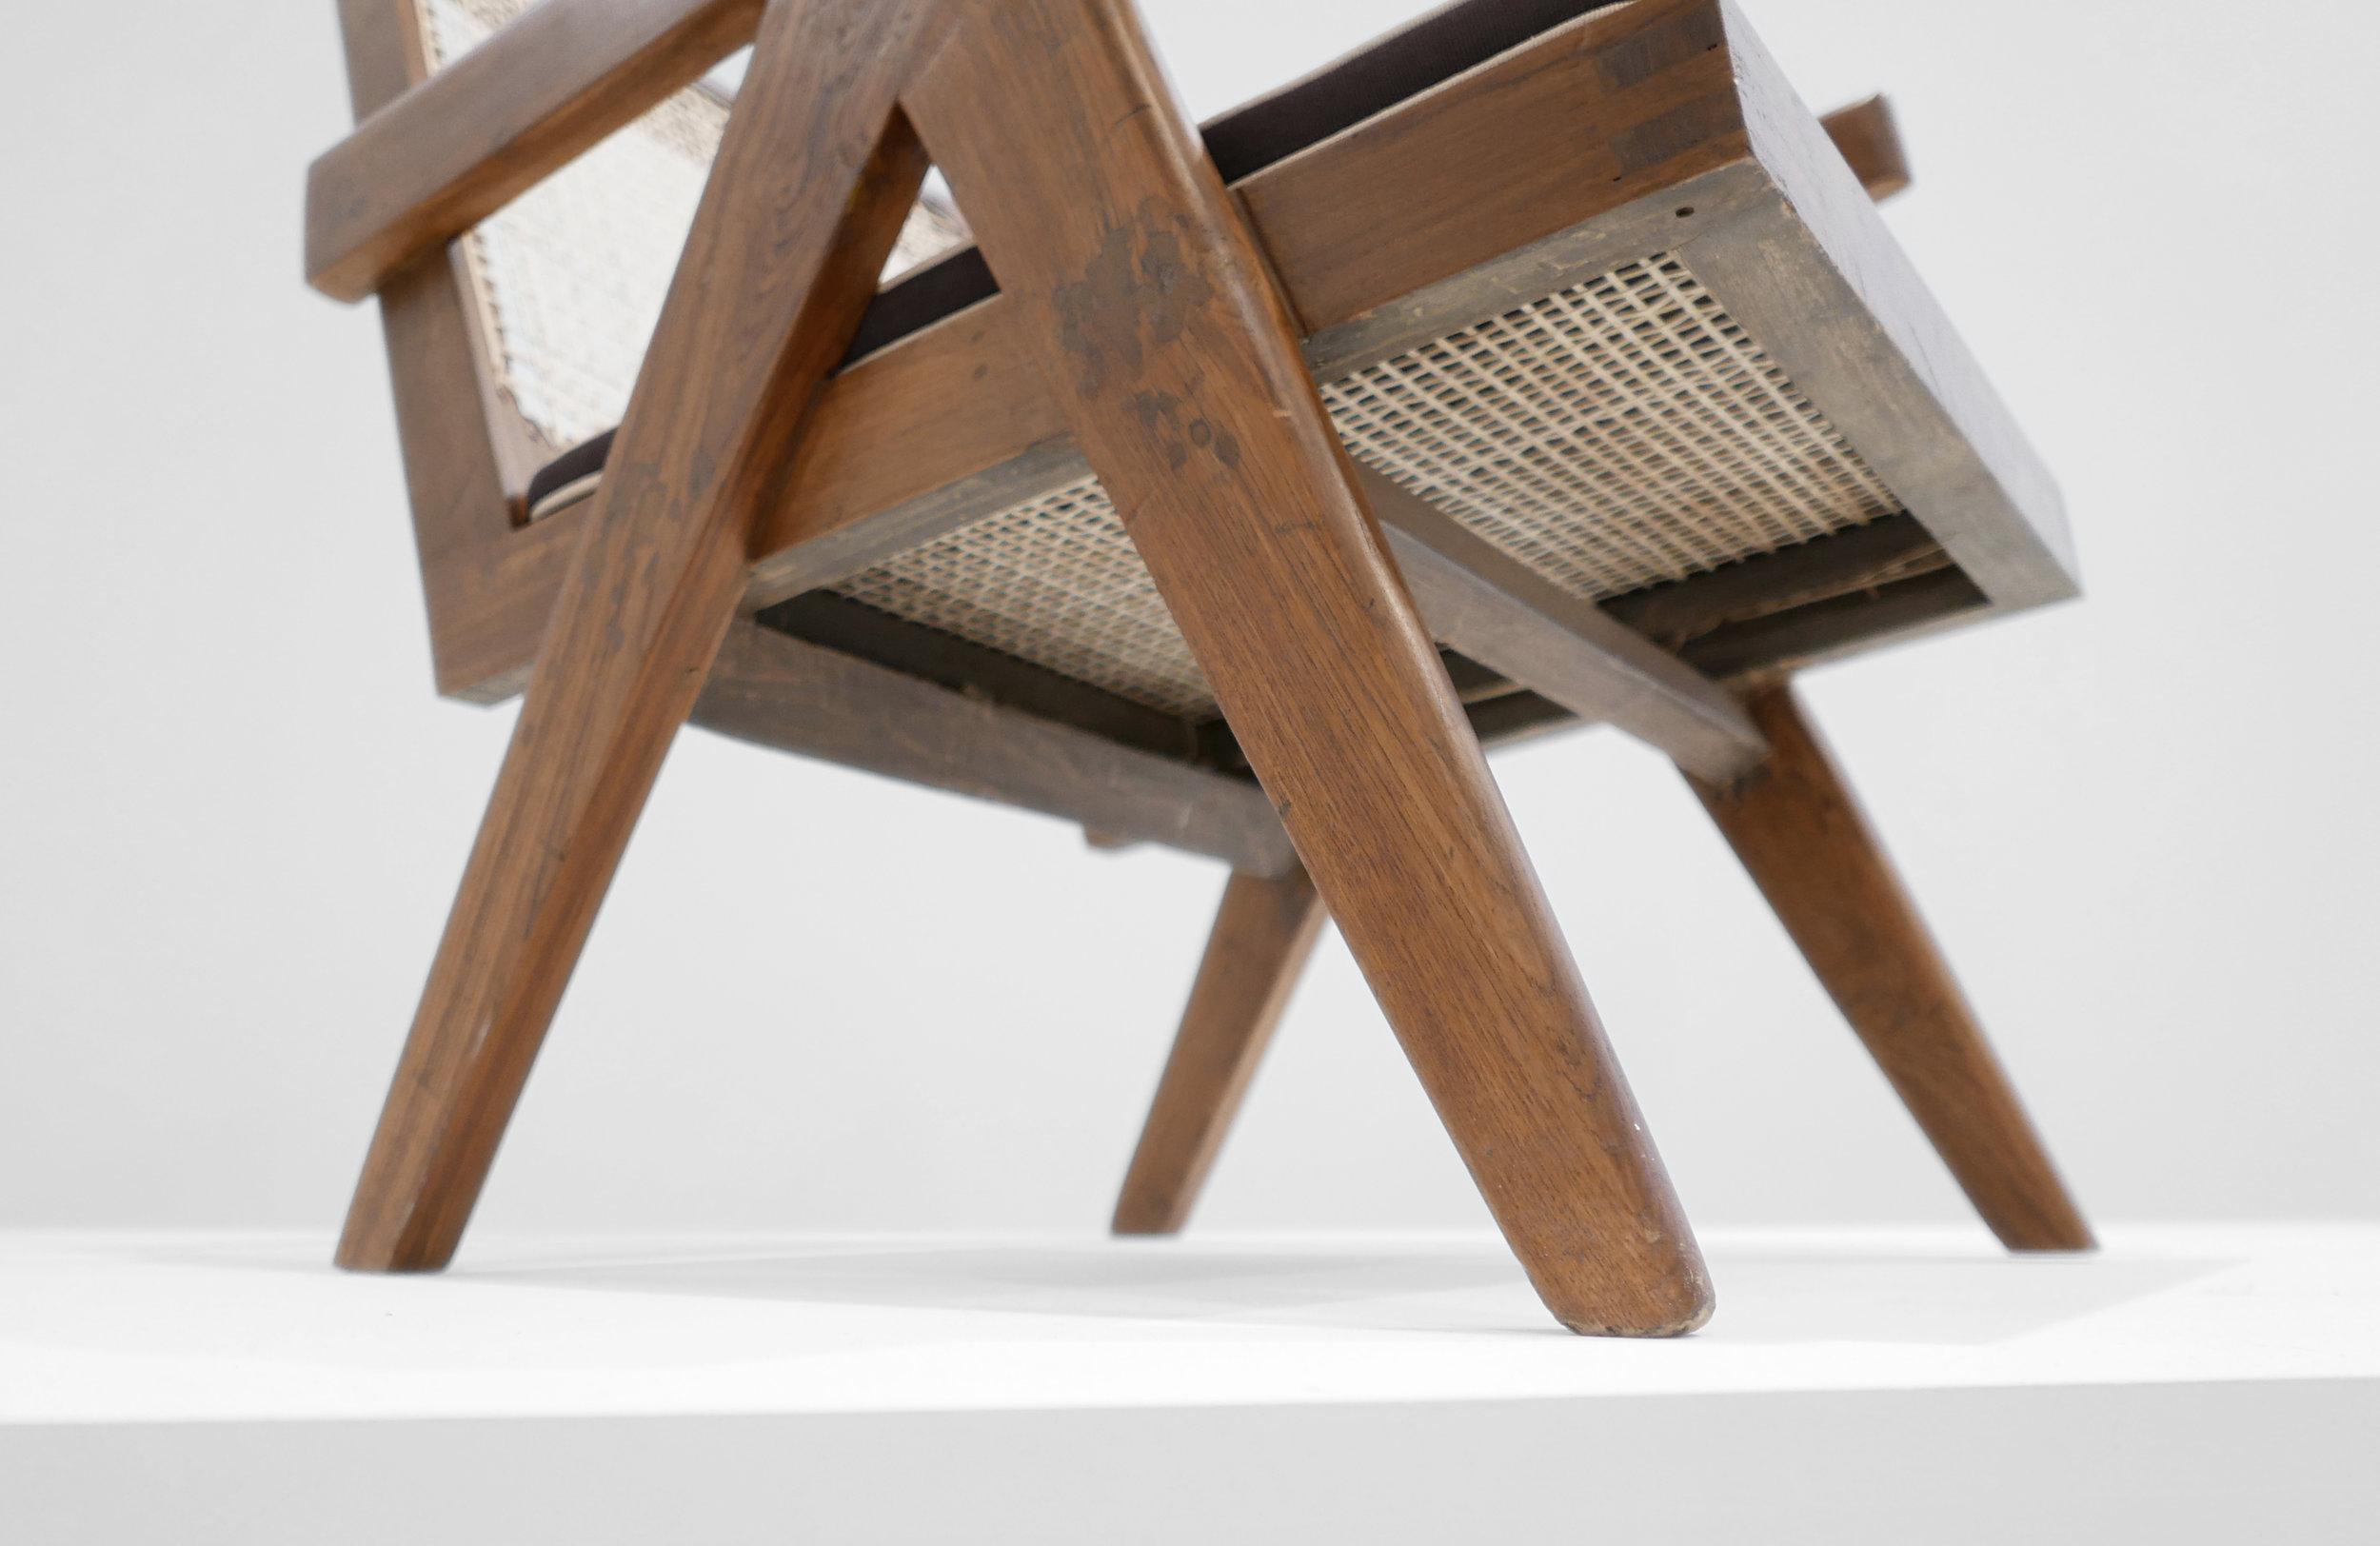 Pierre Jeanneret, Low lounge chair, model PJ-SI-29-A, c. 1955, teak, cane, 24.5H x 20.5W x 29.5D inches_6.jpg